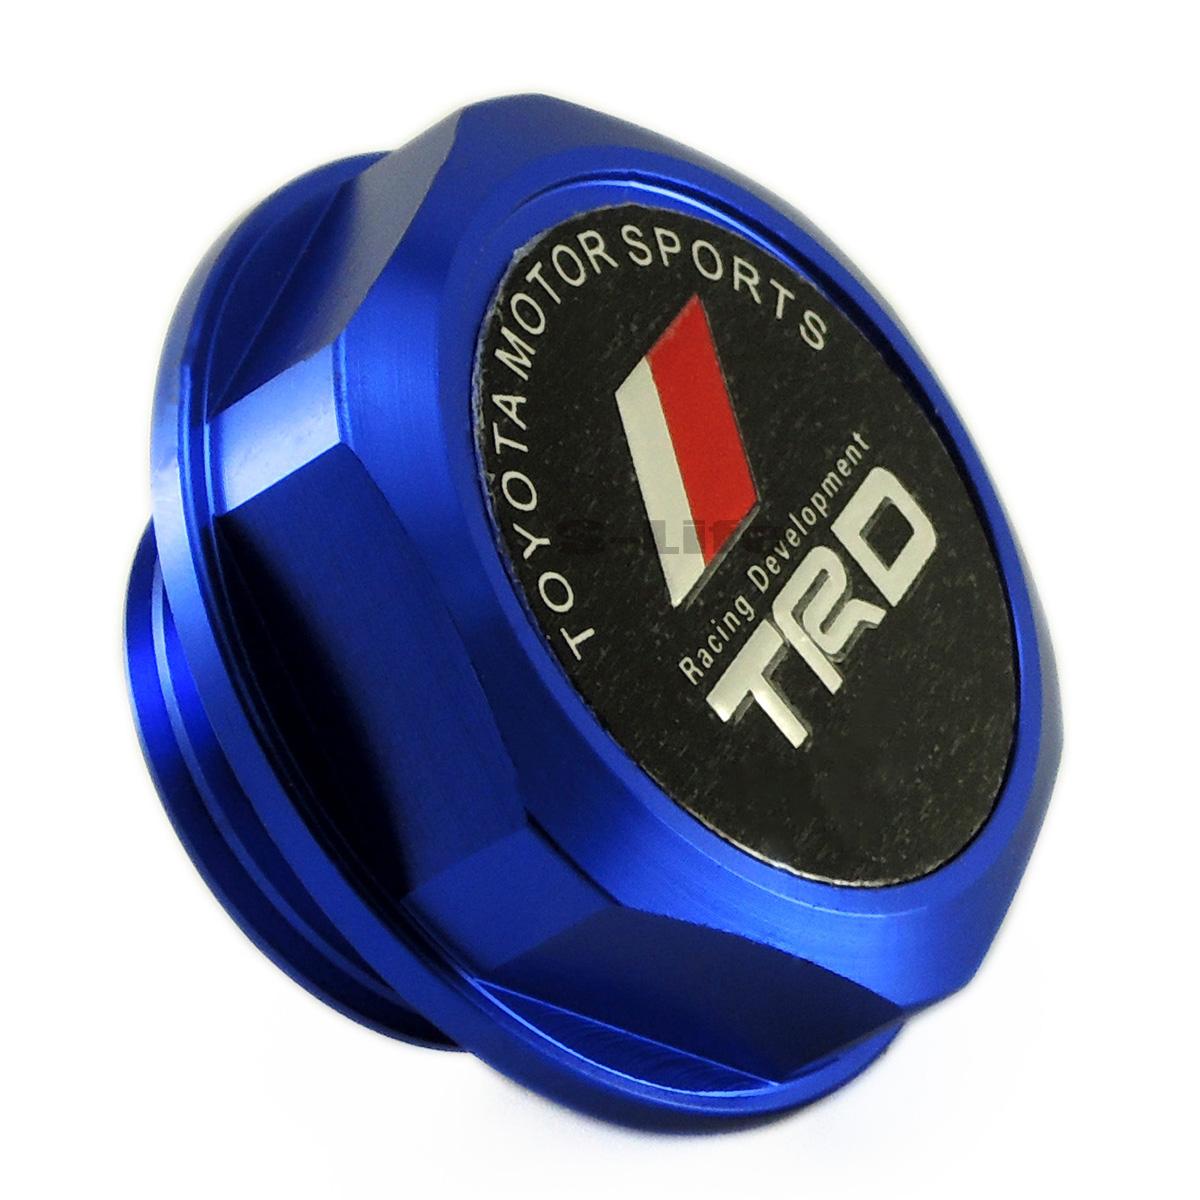 M37x3.0 Thread TRD RED Engine Oil Filler Cap Cover For LEXUS SCION For TOYOTA